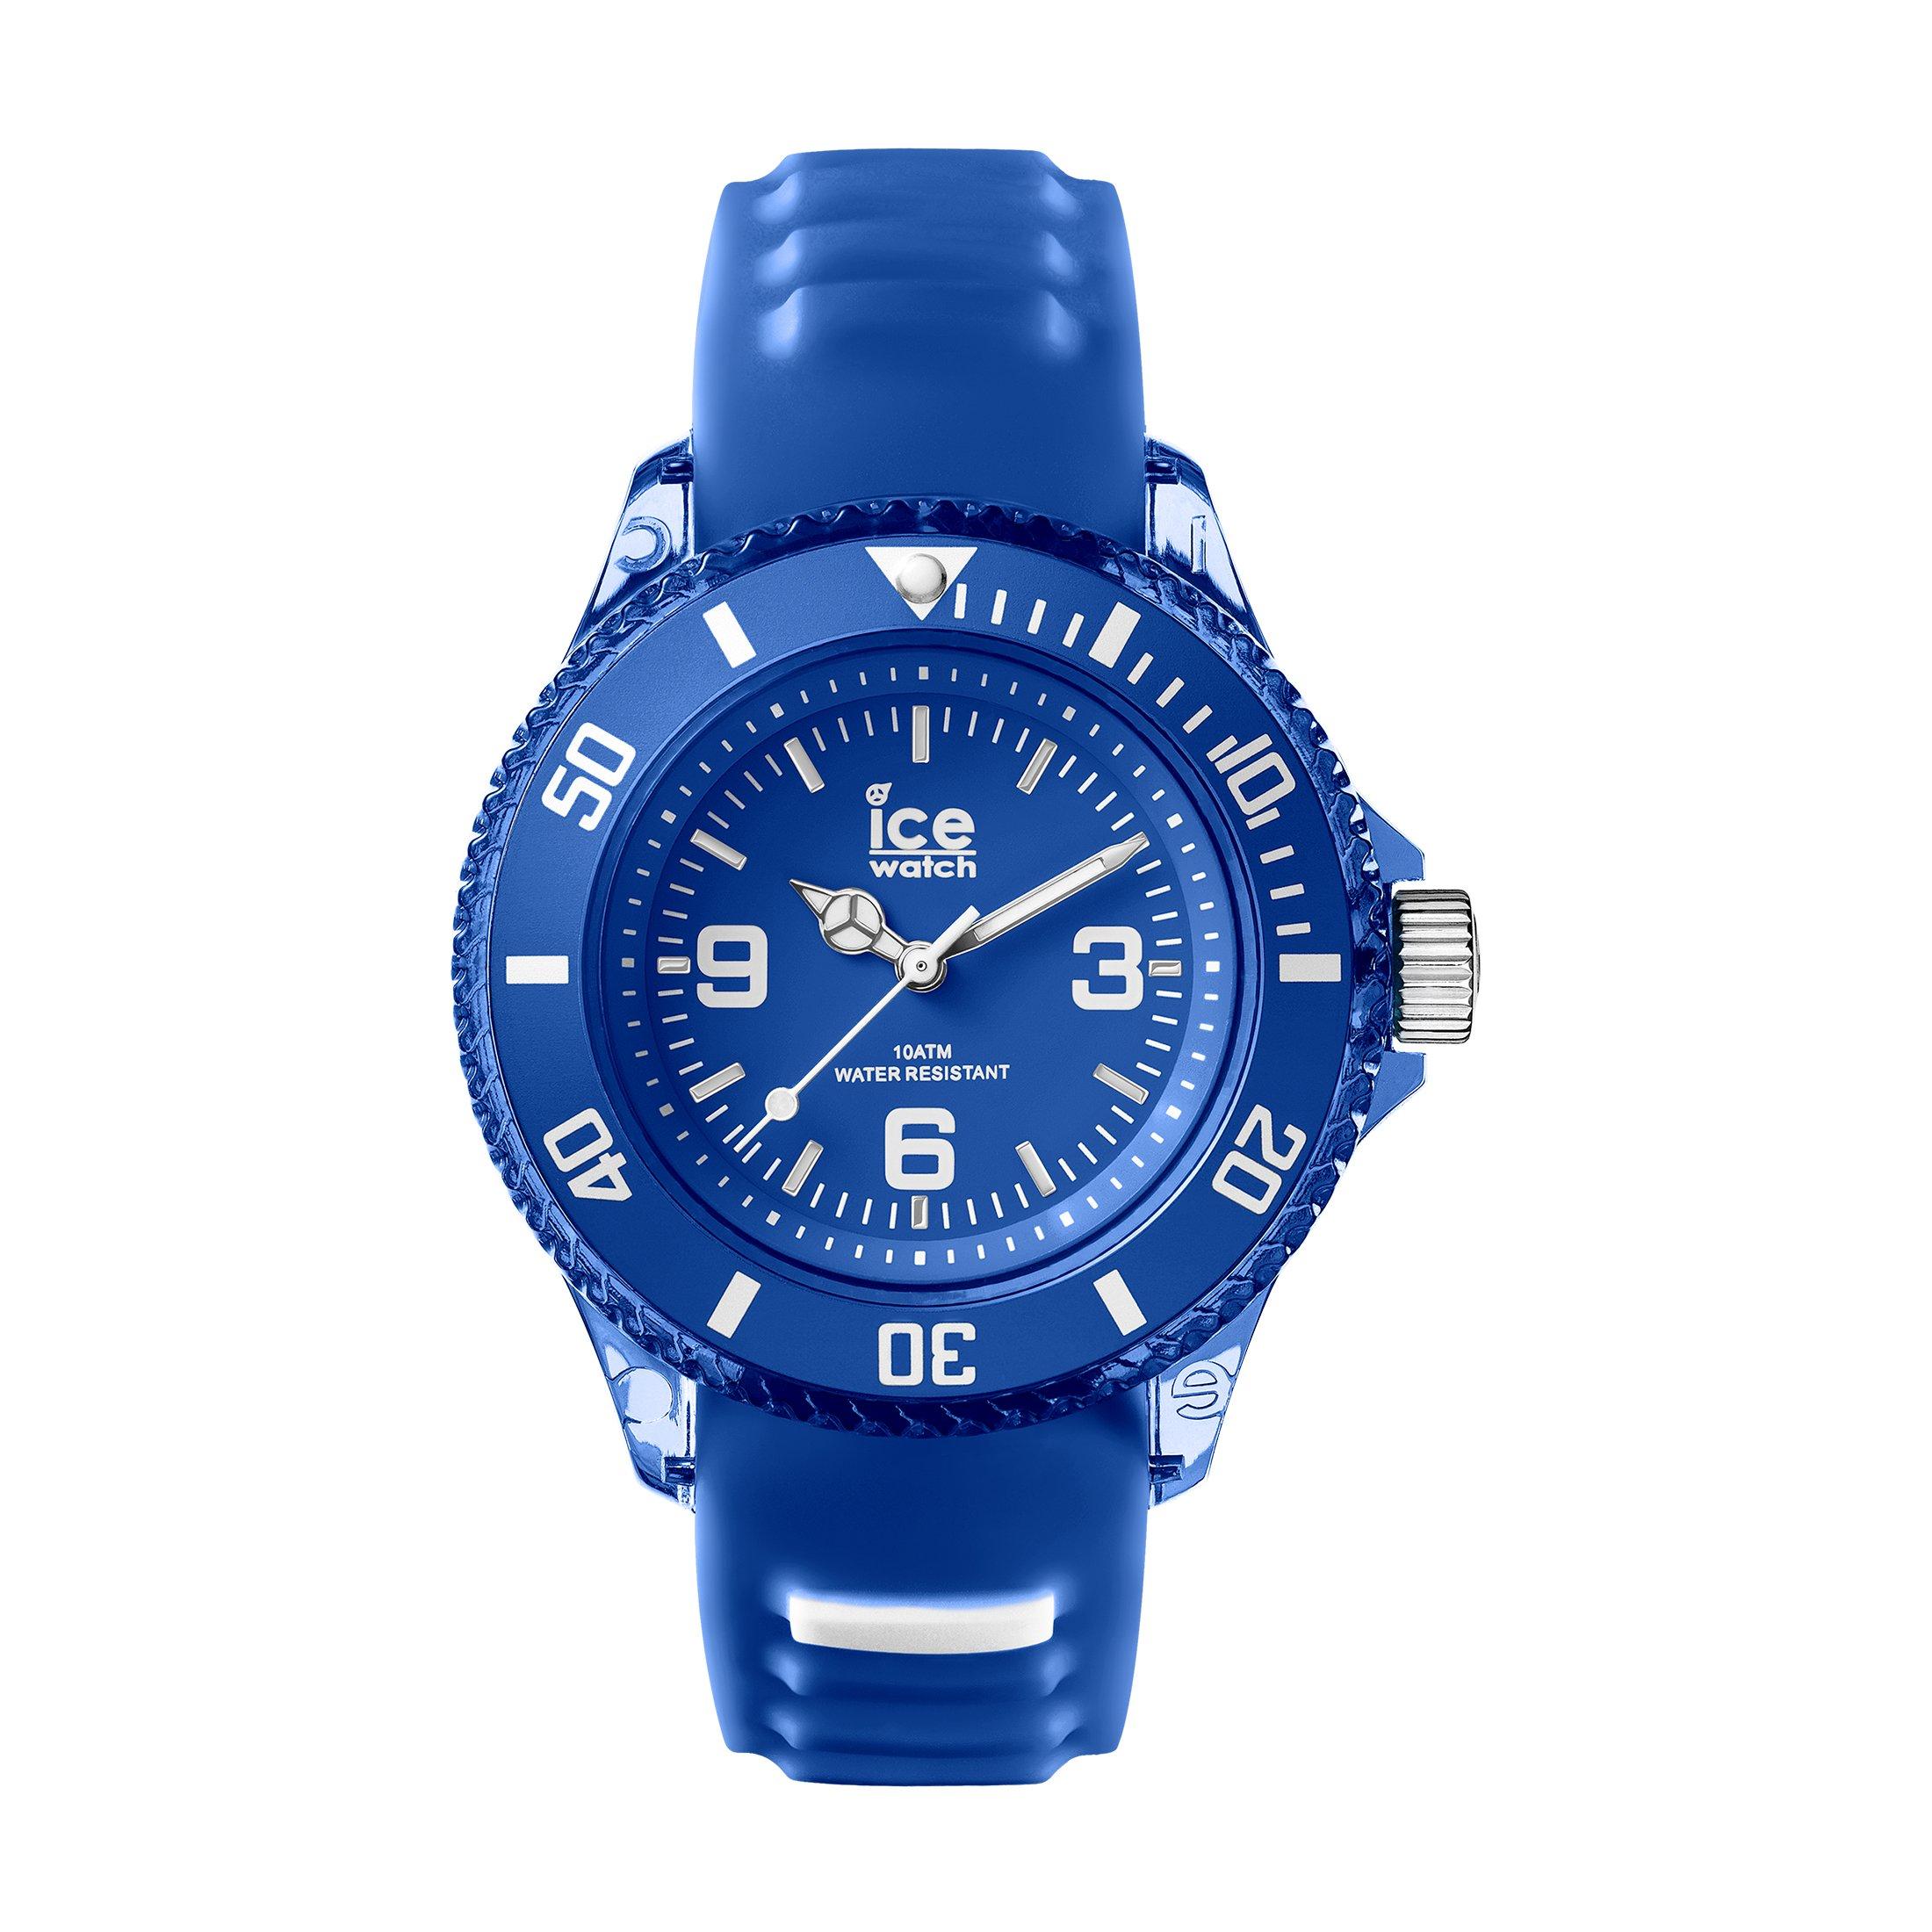 Ice-Watch AQ.MAR.S.S.15 Ice-Aqua Small Marine Blue Silicone Strap Watch